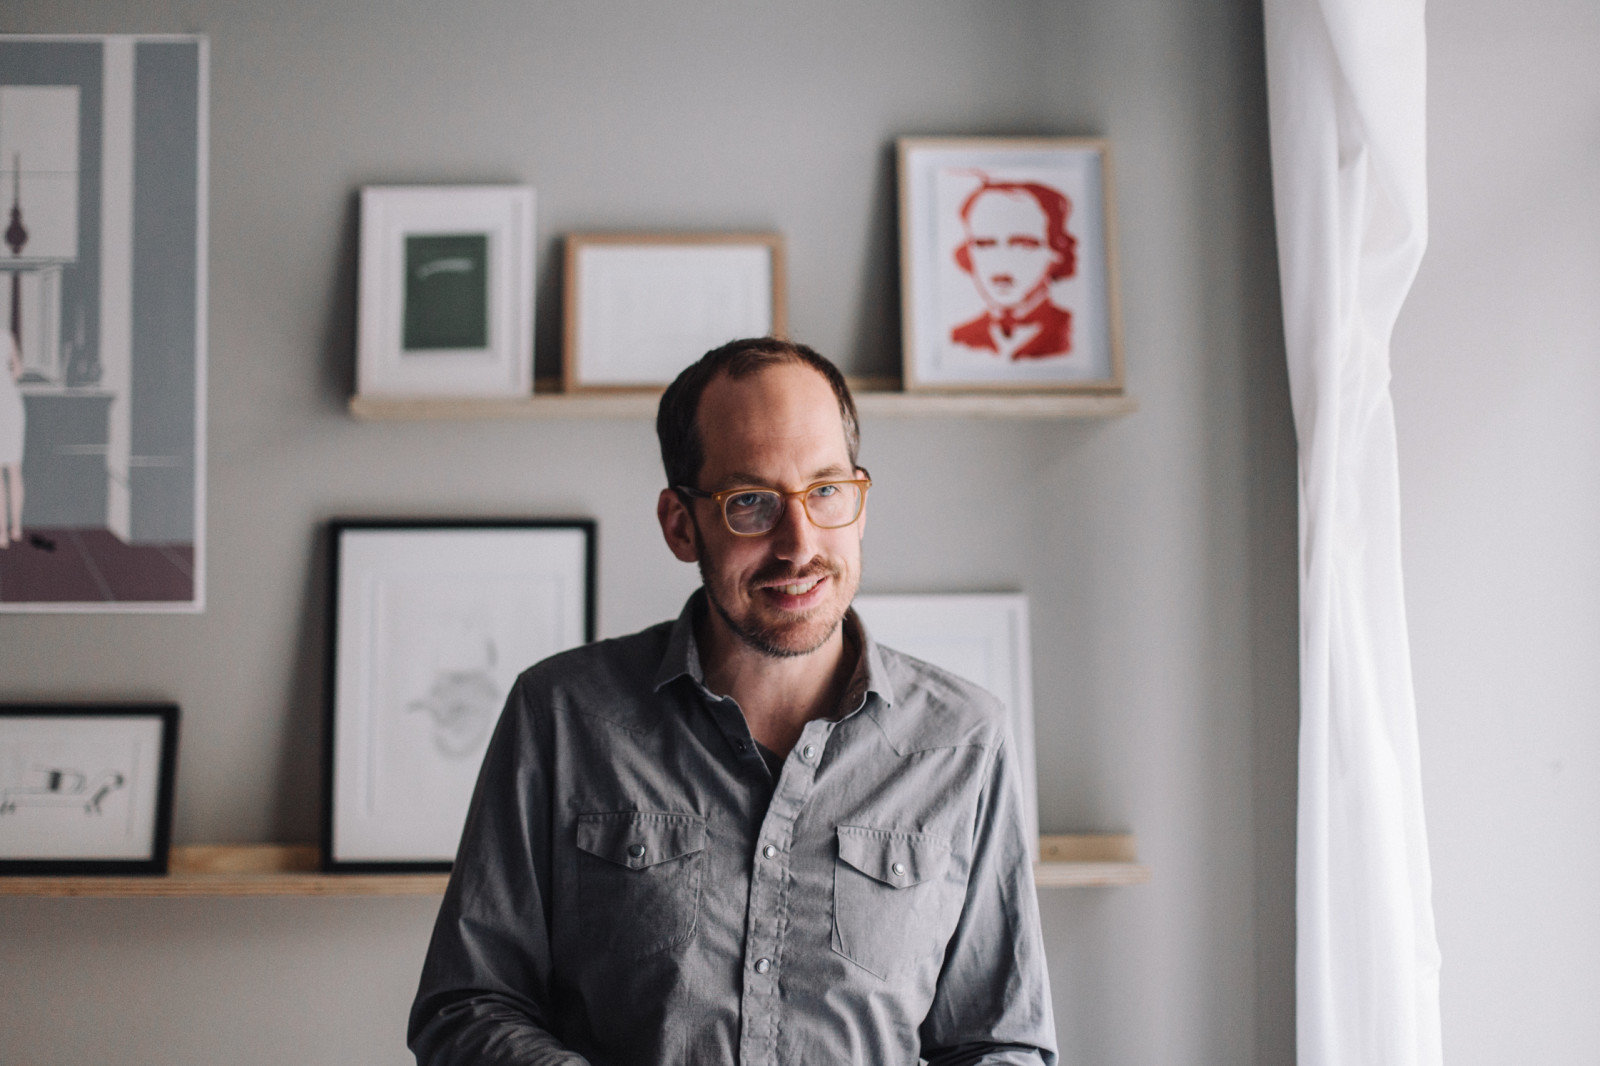 Christoph Niemann on the art of reinvention